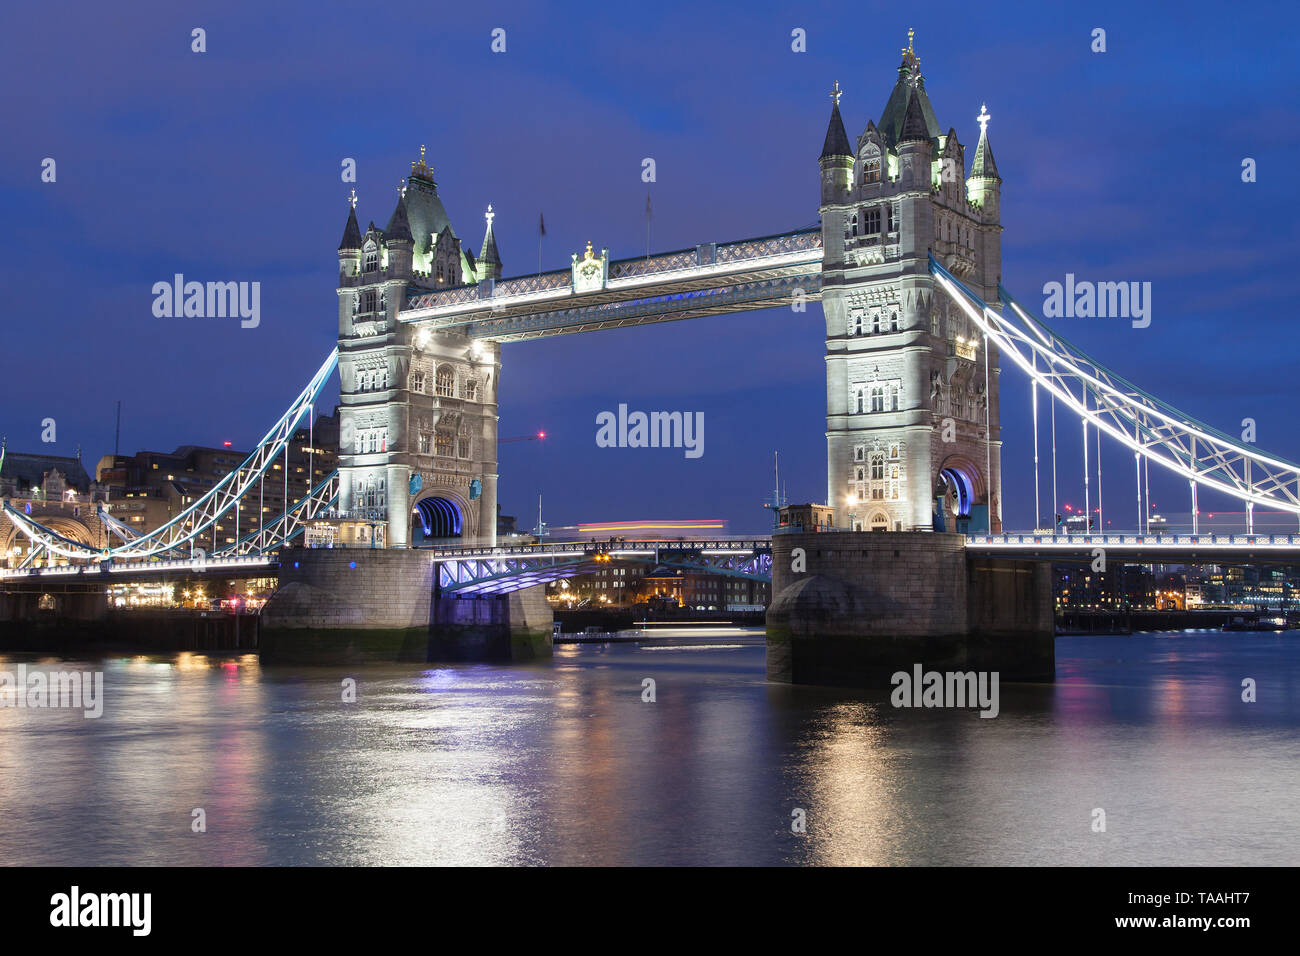 Tower Bridge at night, London, United Kingdom. Stock Photo